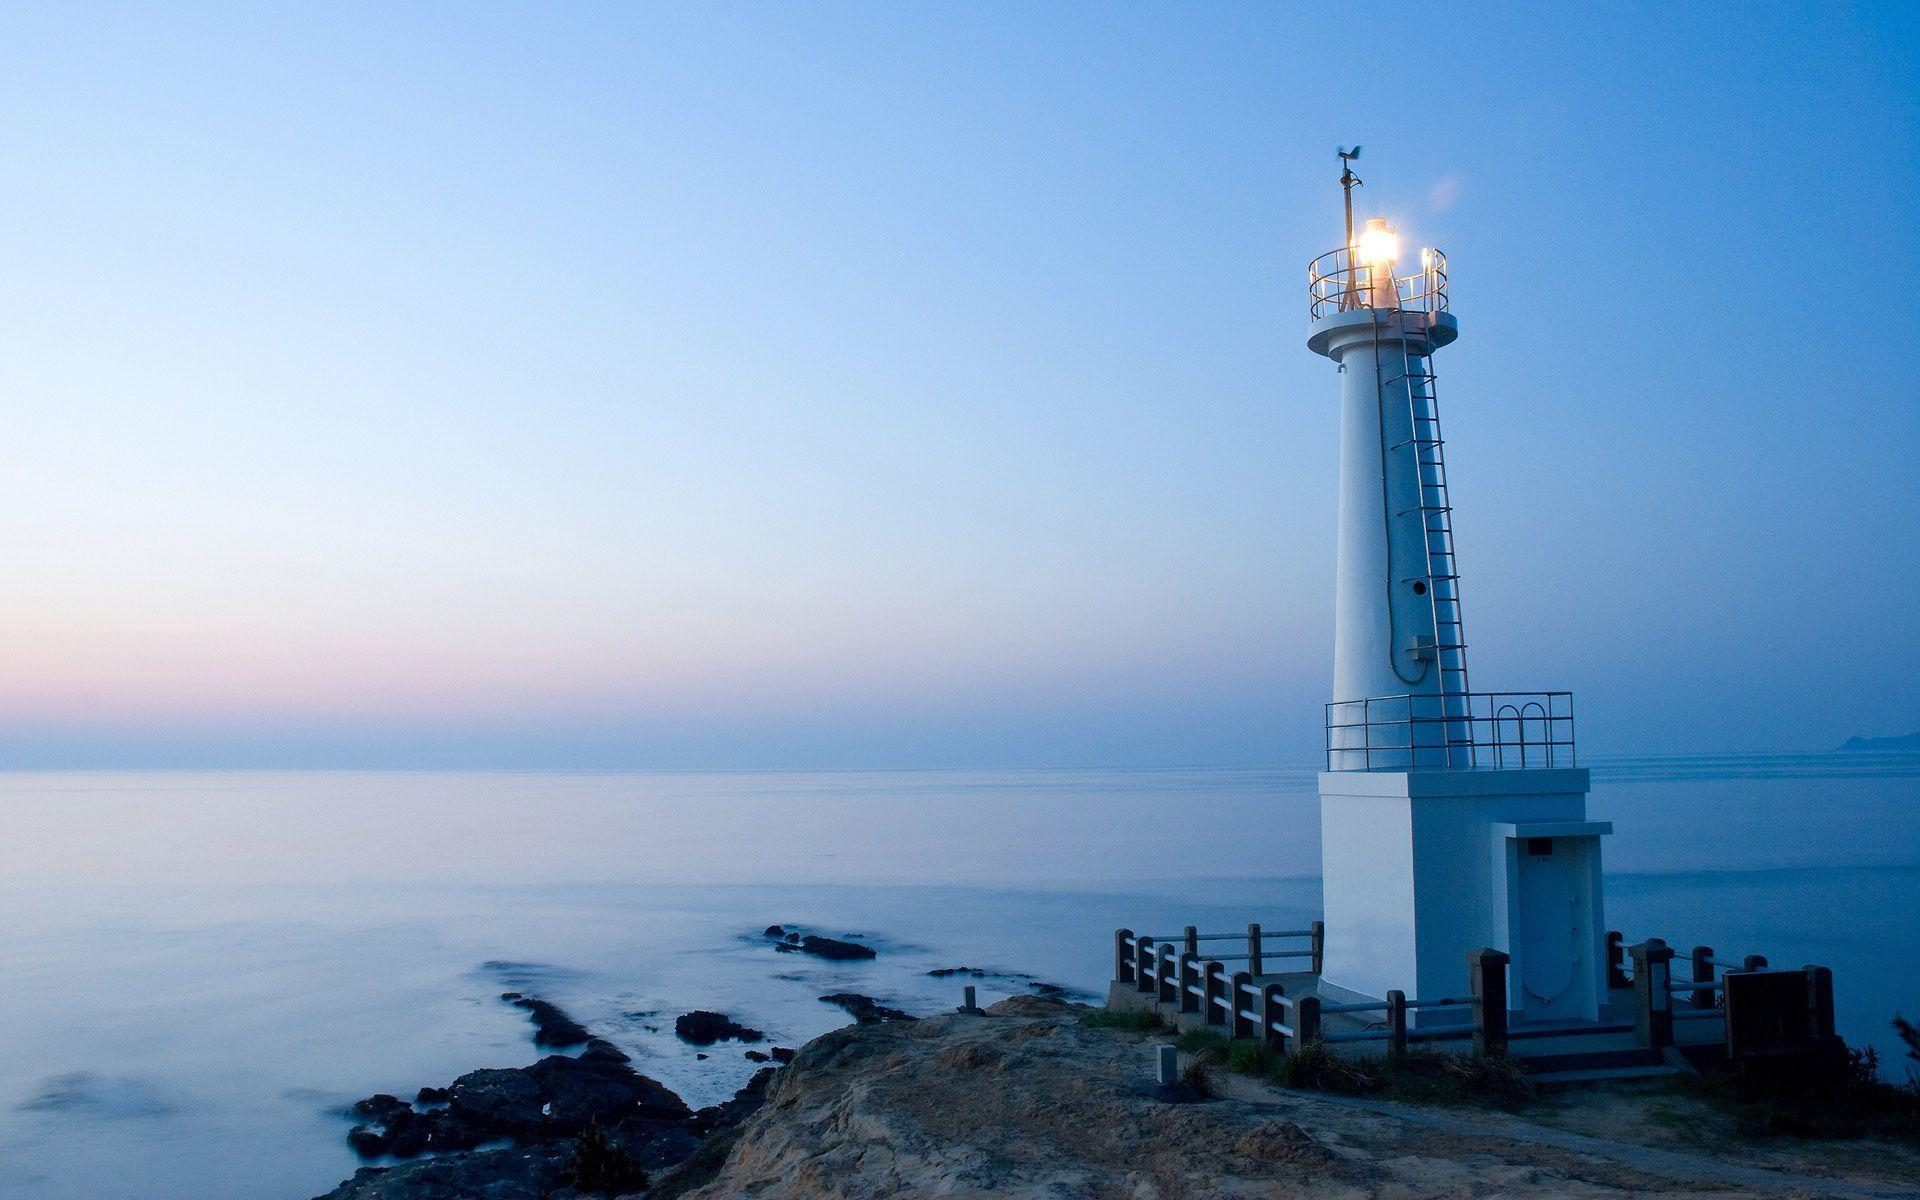 lighthouse desktop wallpapers www wallpaper free download com